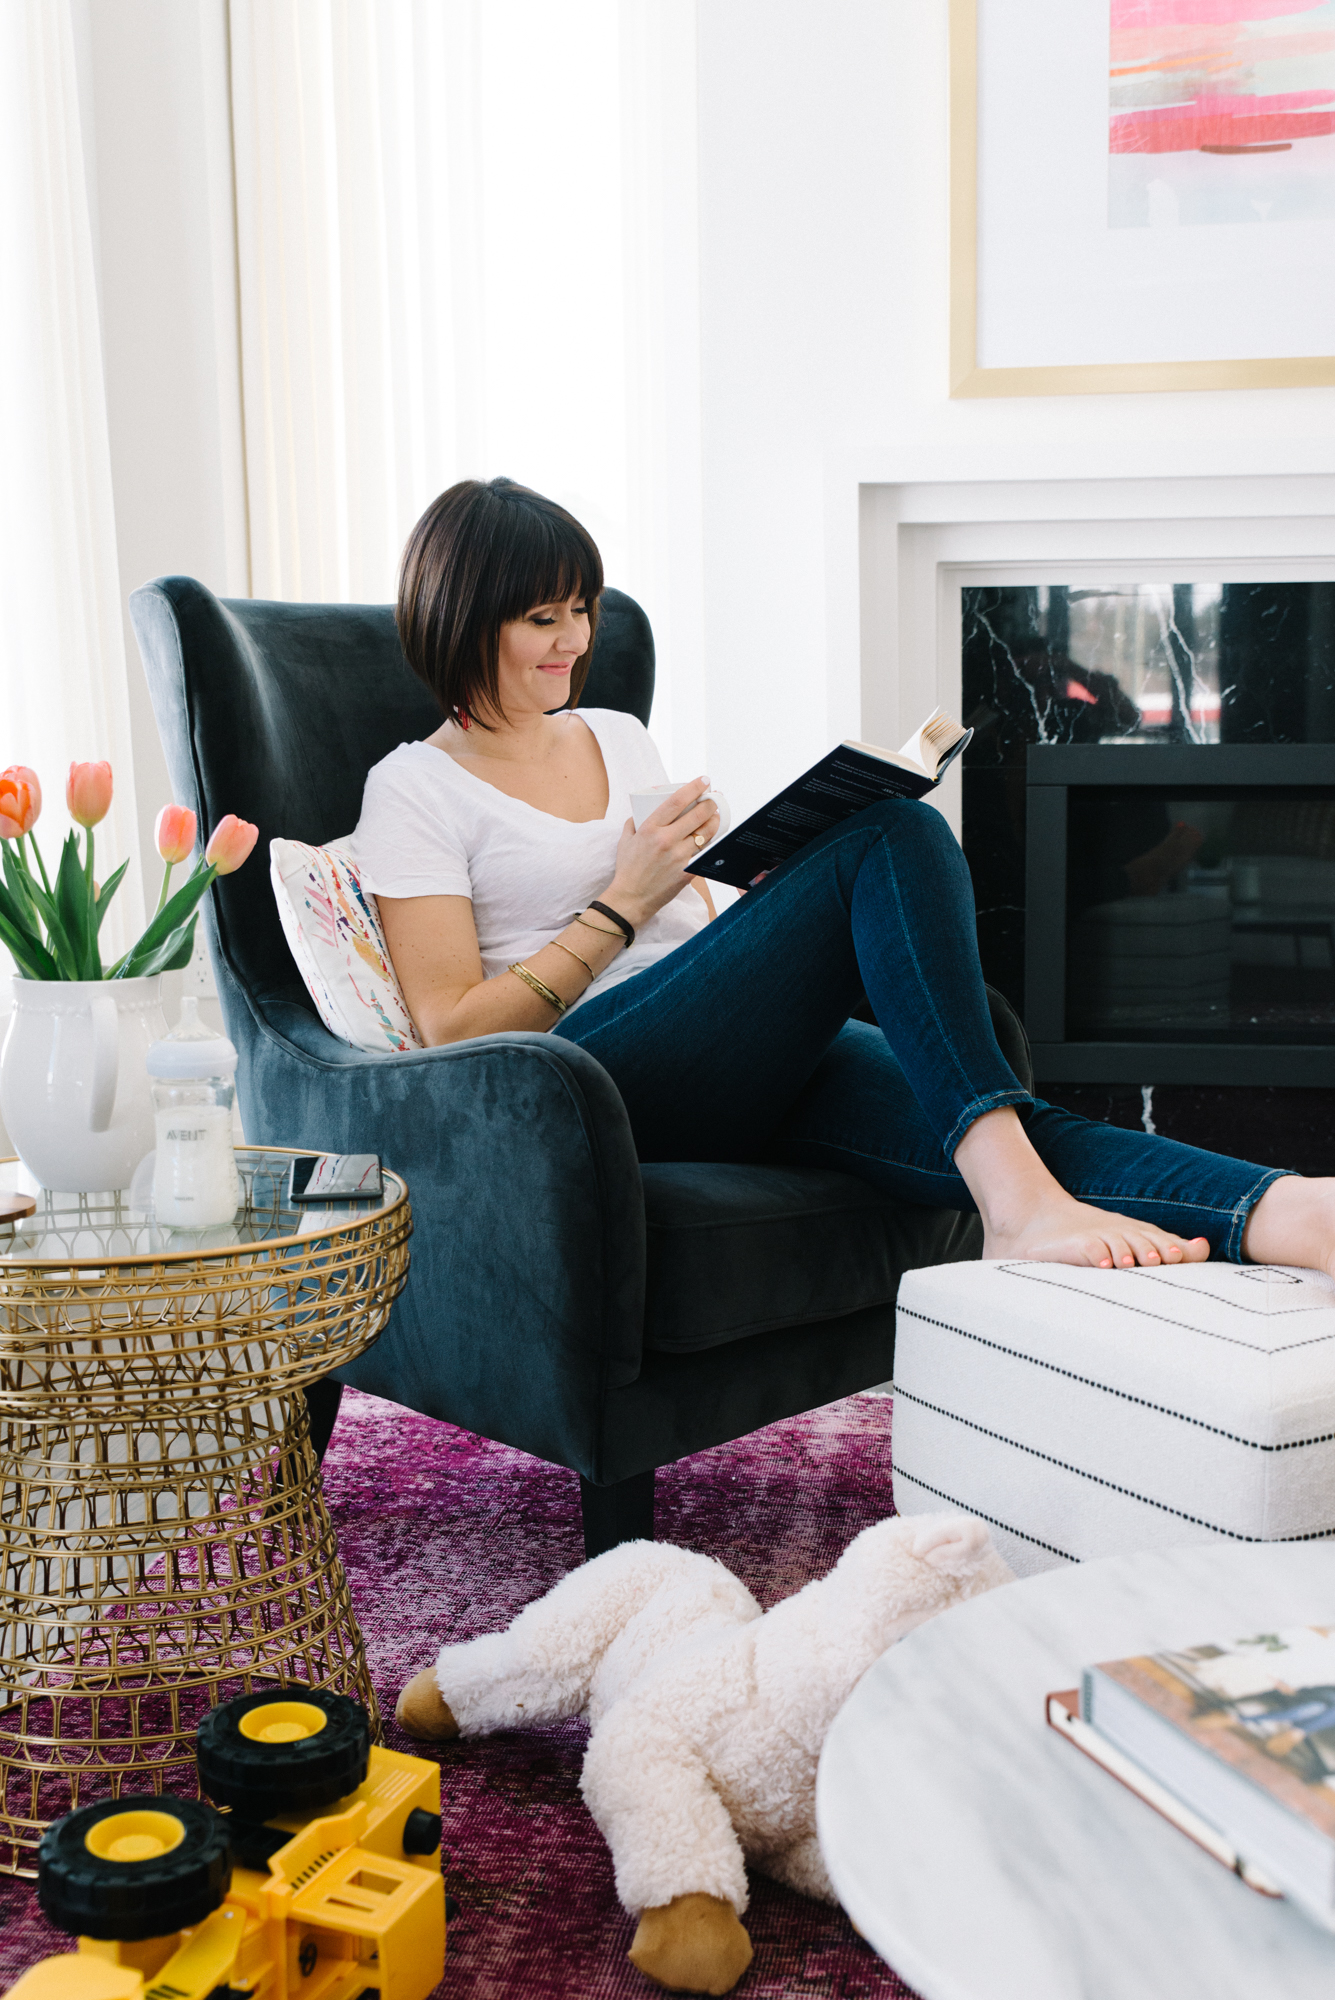 StefEthan-RebeccaHayDesigns-Aurora-InteriorDesigner-InteriorDesign-TorontoPortraitPhotographer-LifestylePhotography-TorontoInteriorDesigner-9.JPG